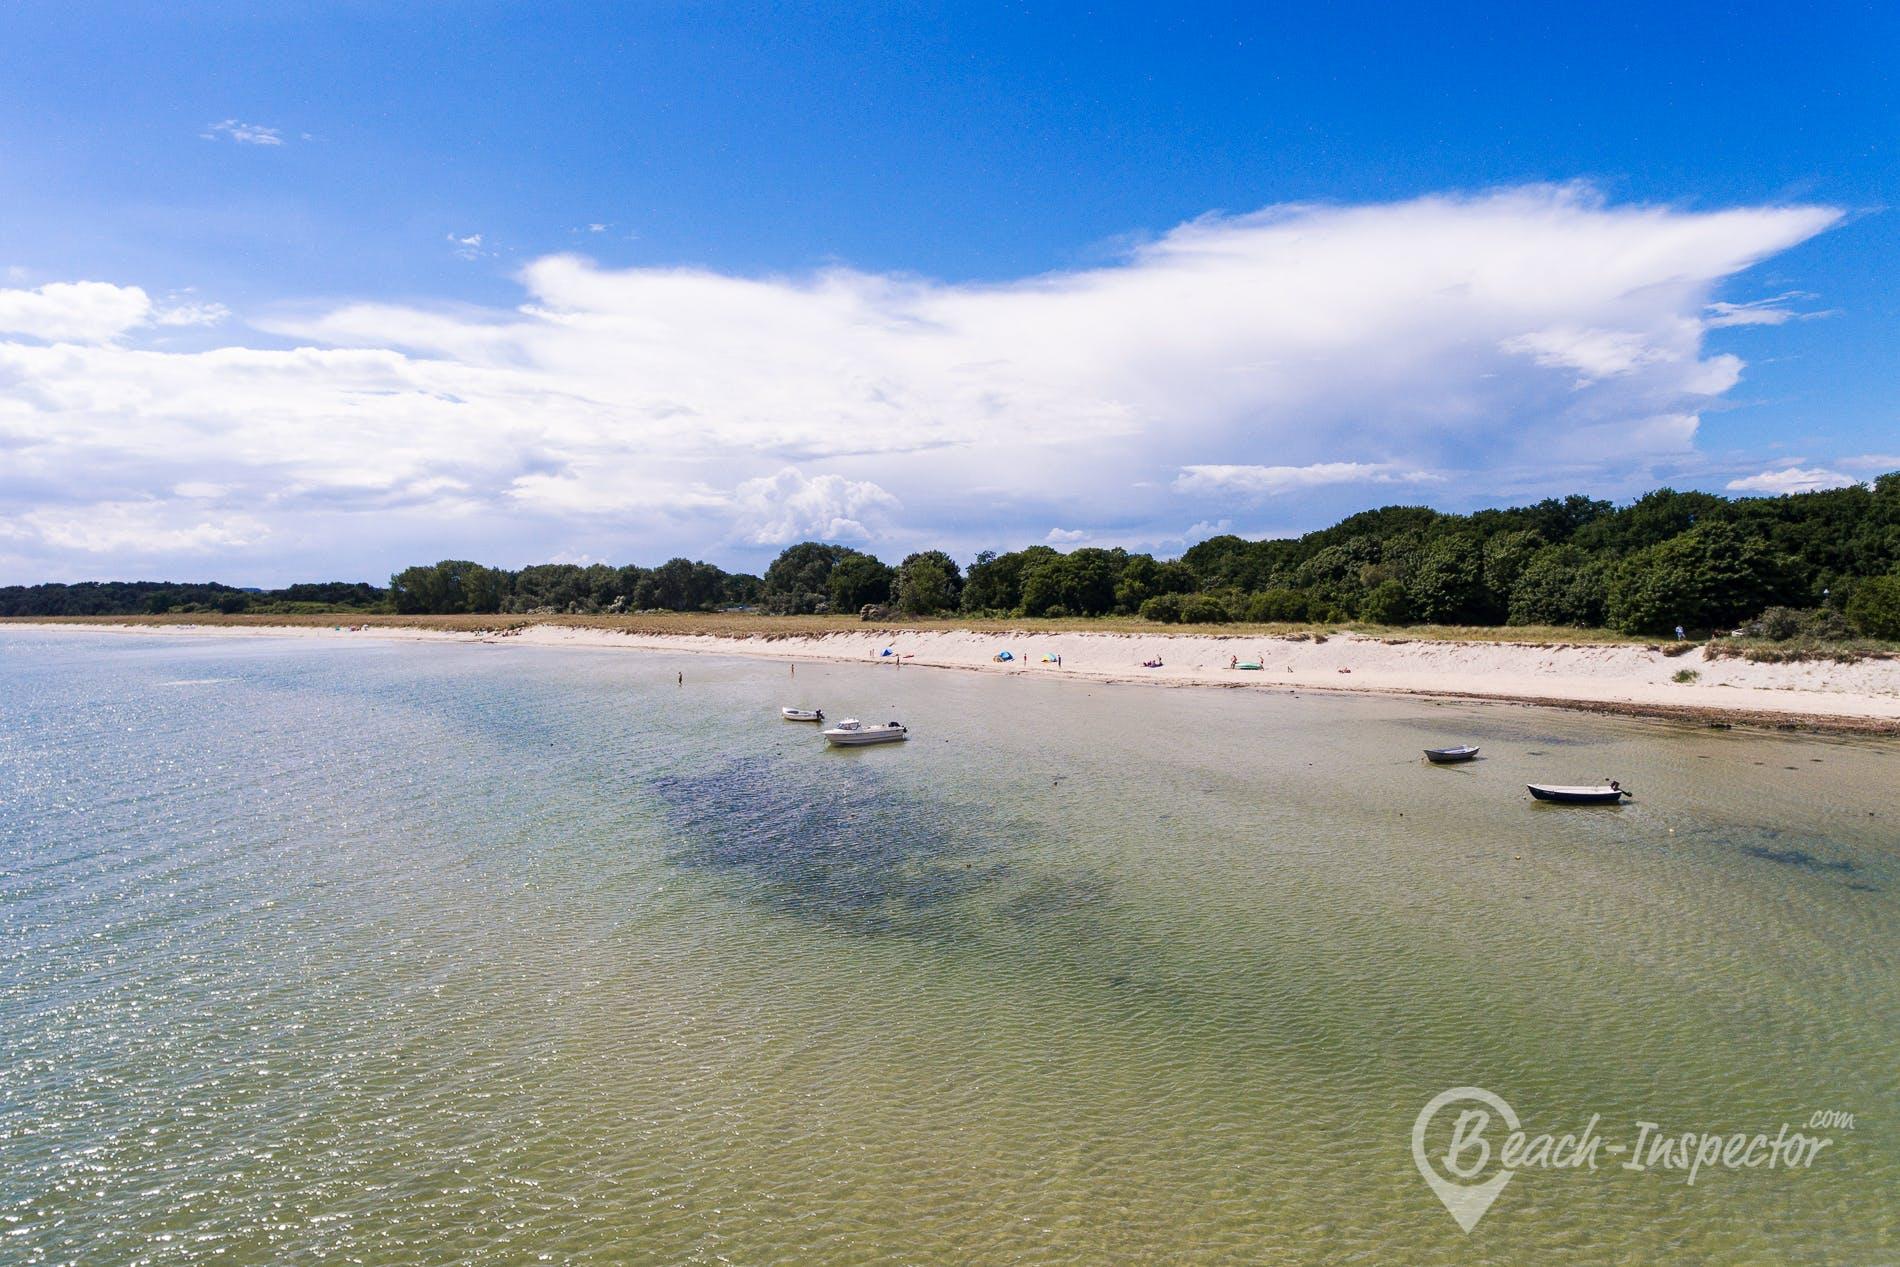 Playa Südstrand Göhren, Rügen, Alemania